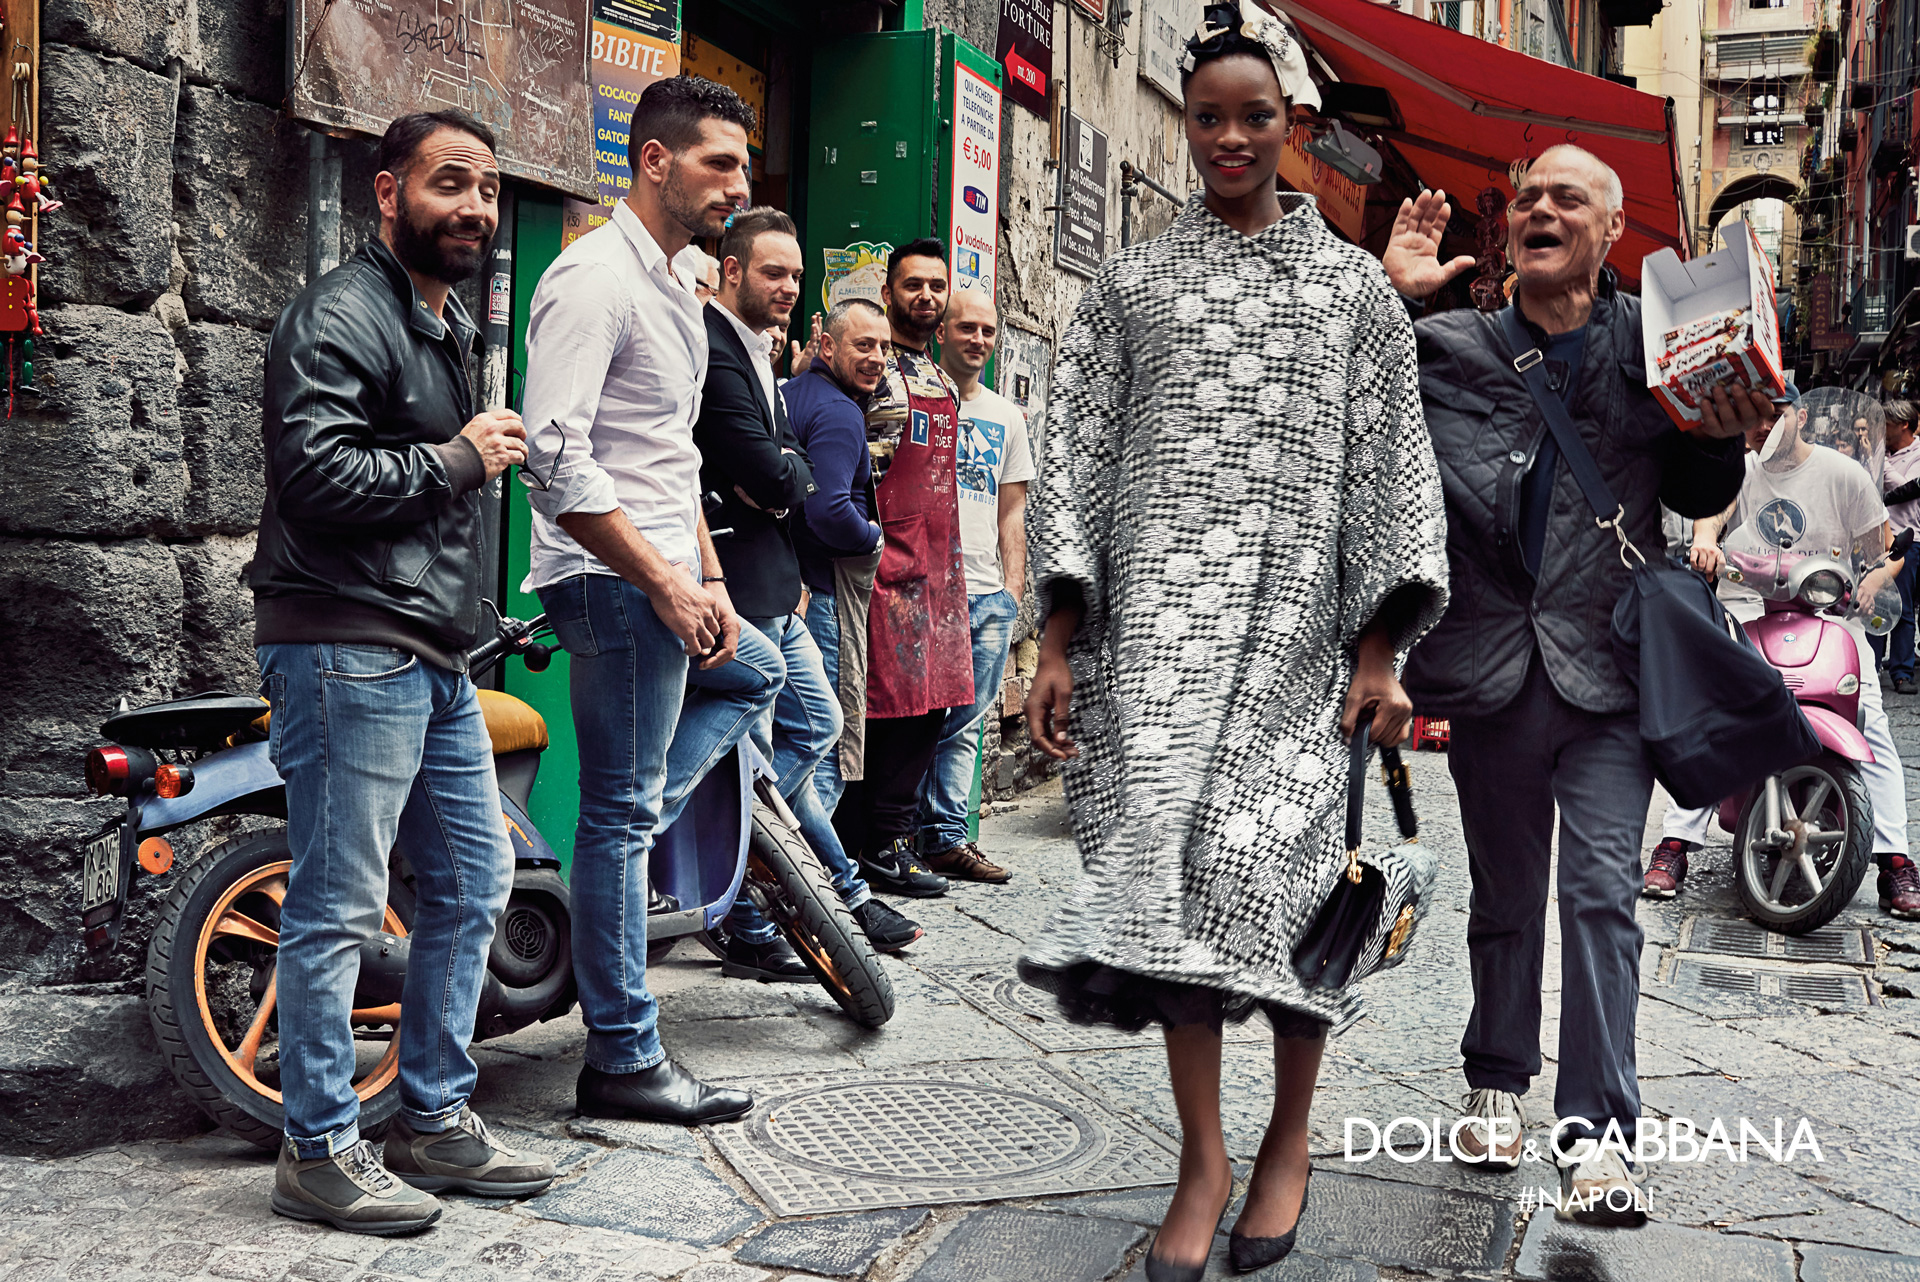 Dolce-Gabbana-Fall-Winter-2016-2017-Ad-Campaign-Naples-7